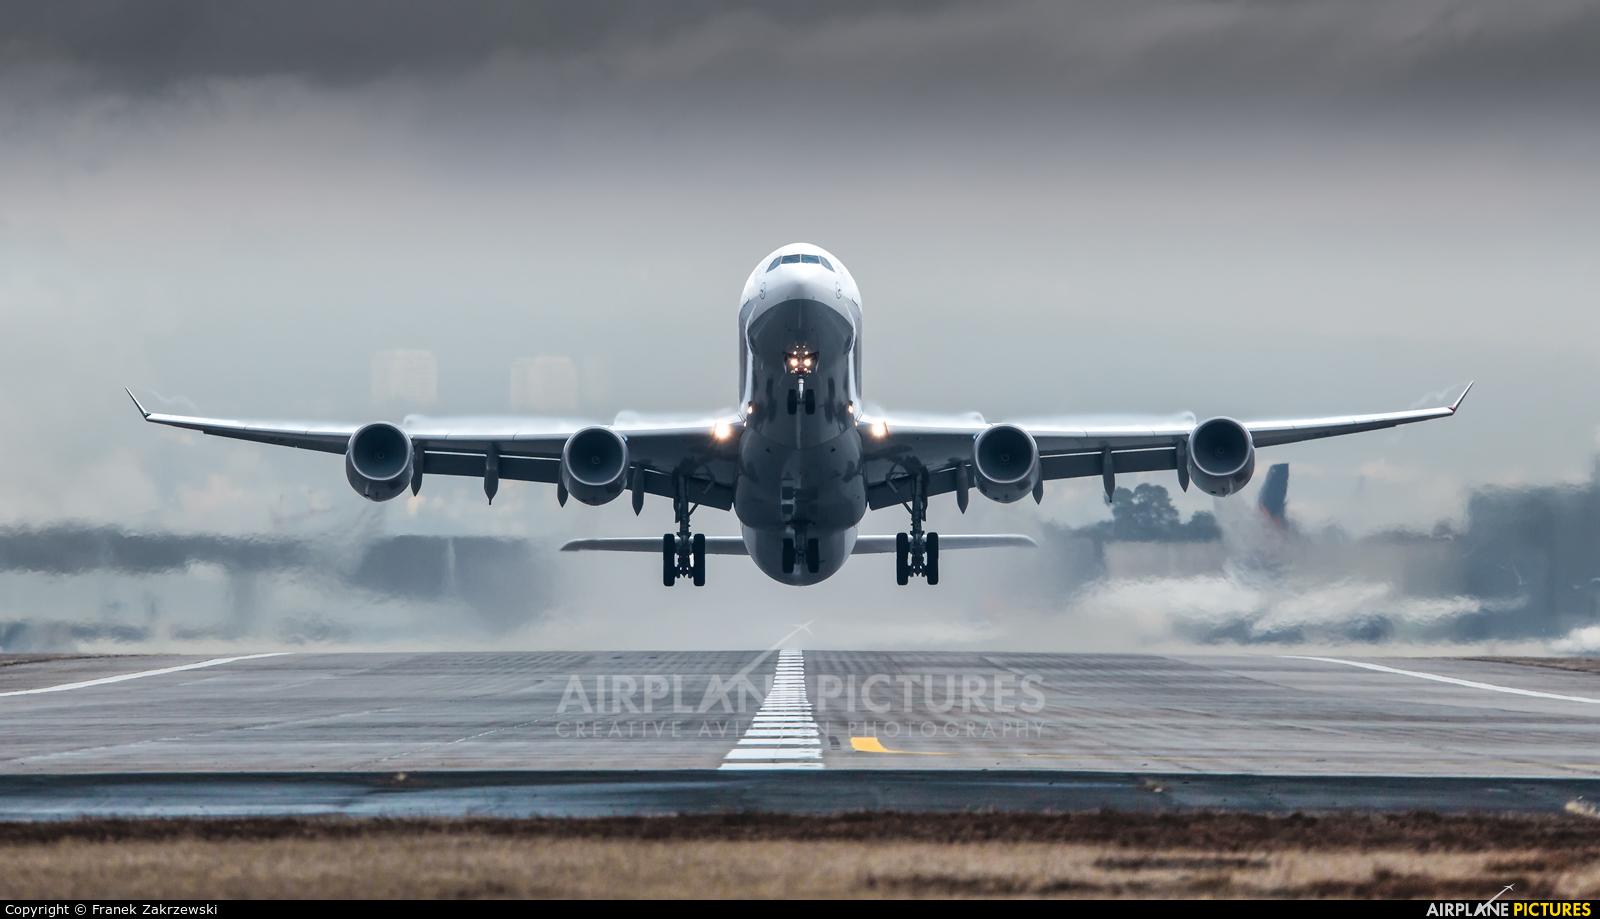 Lufthansa D-AIHW aircraft at Frankfurt